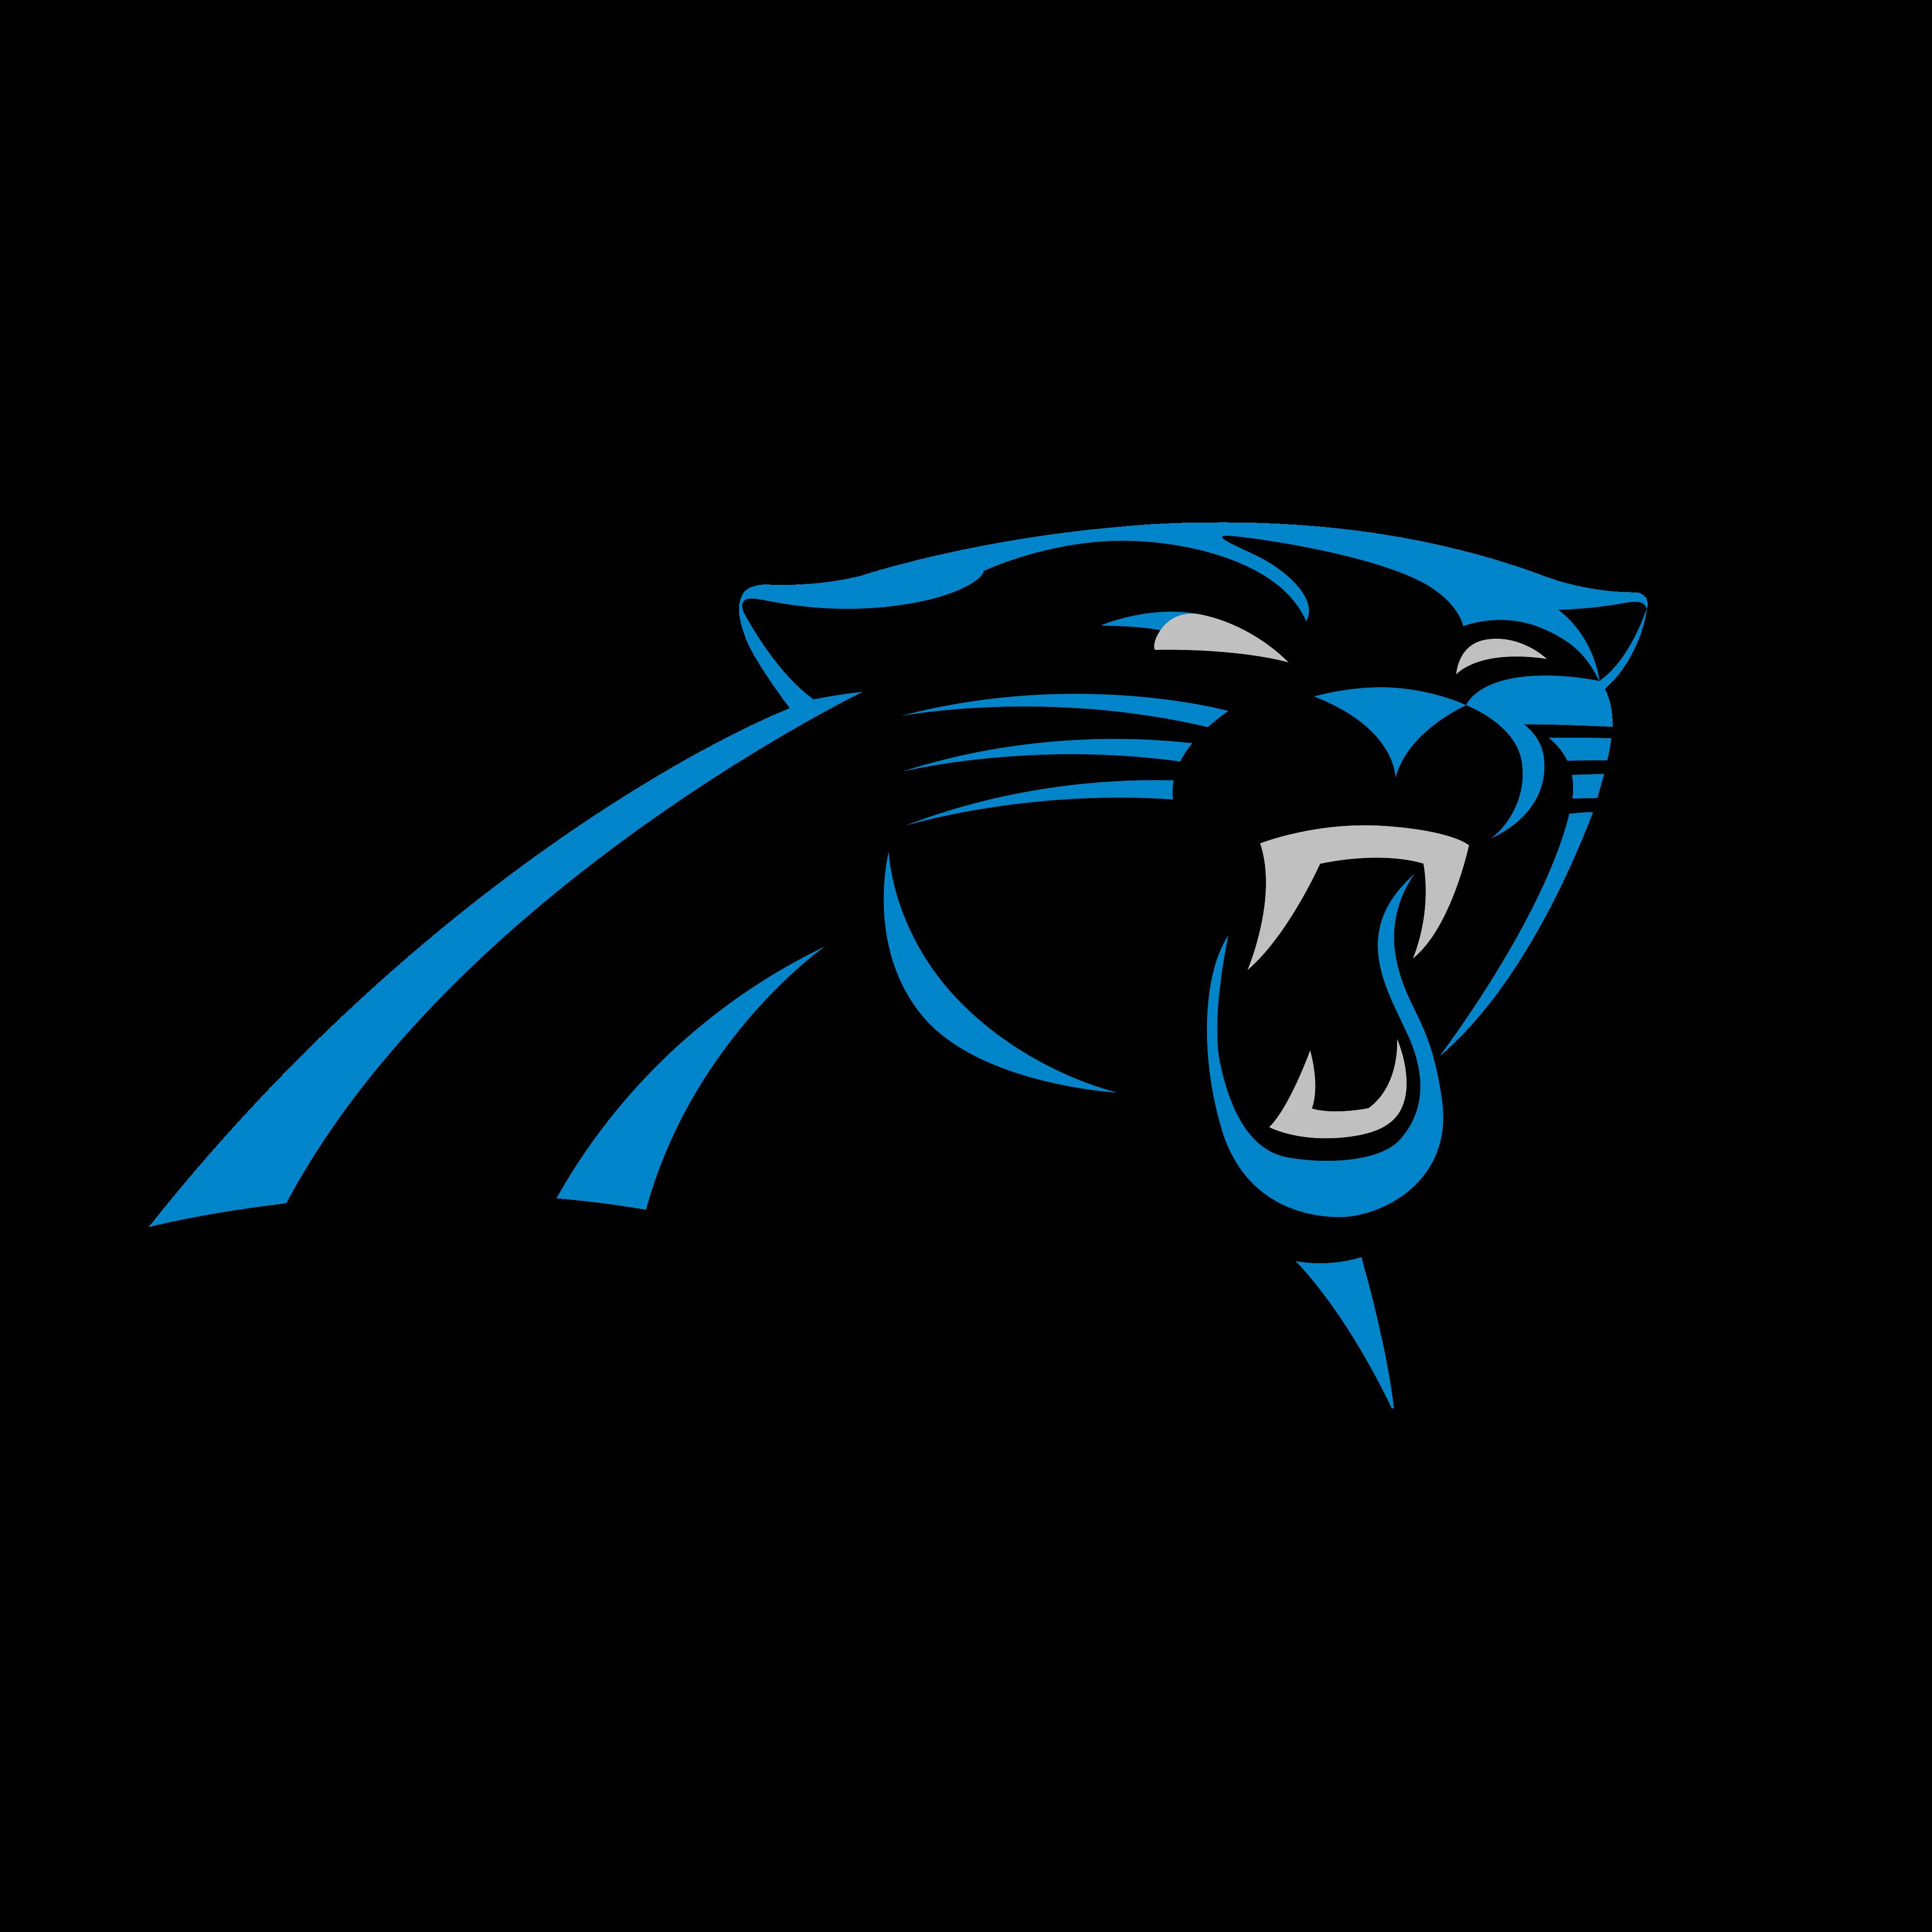 carolina panthers logo 0 - Carolina Panthers Logo